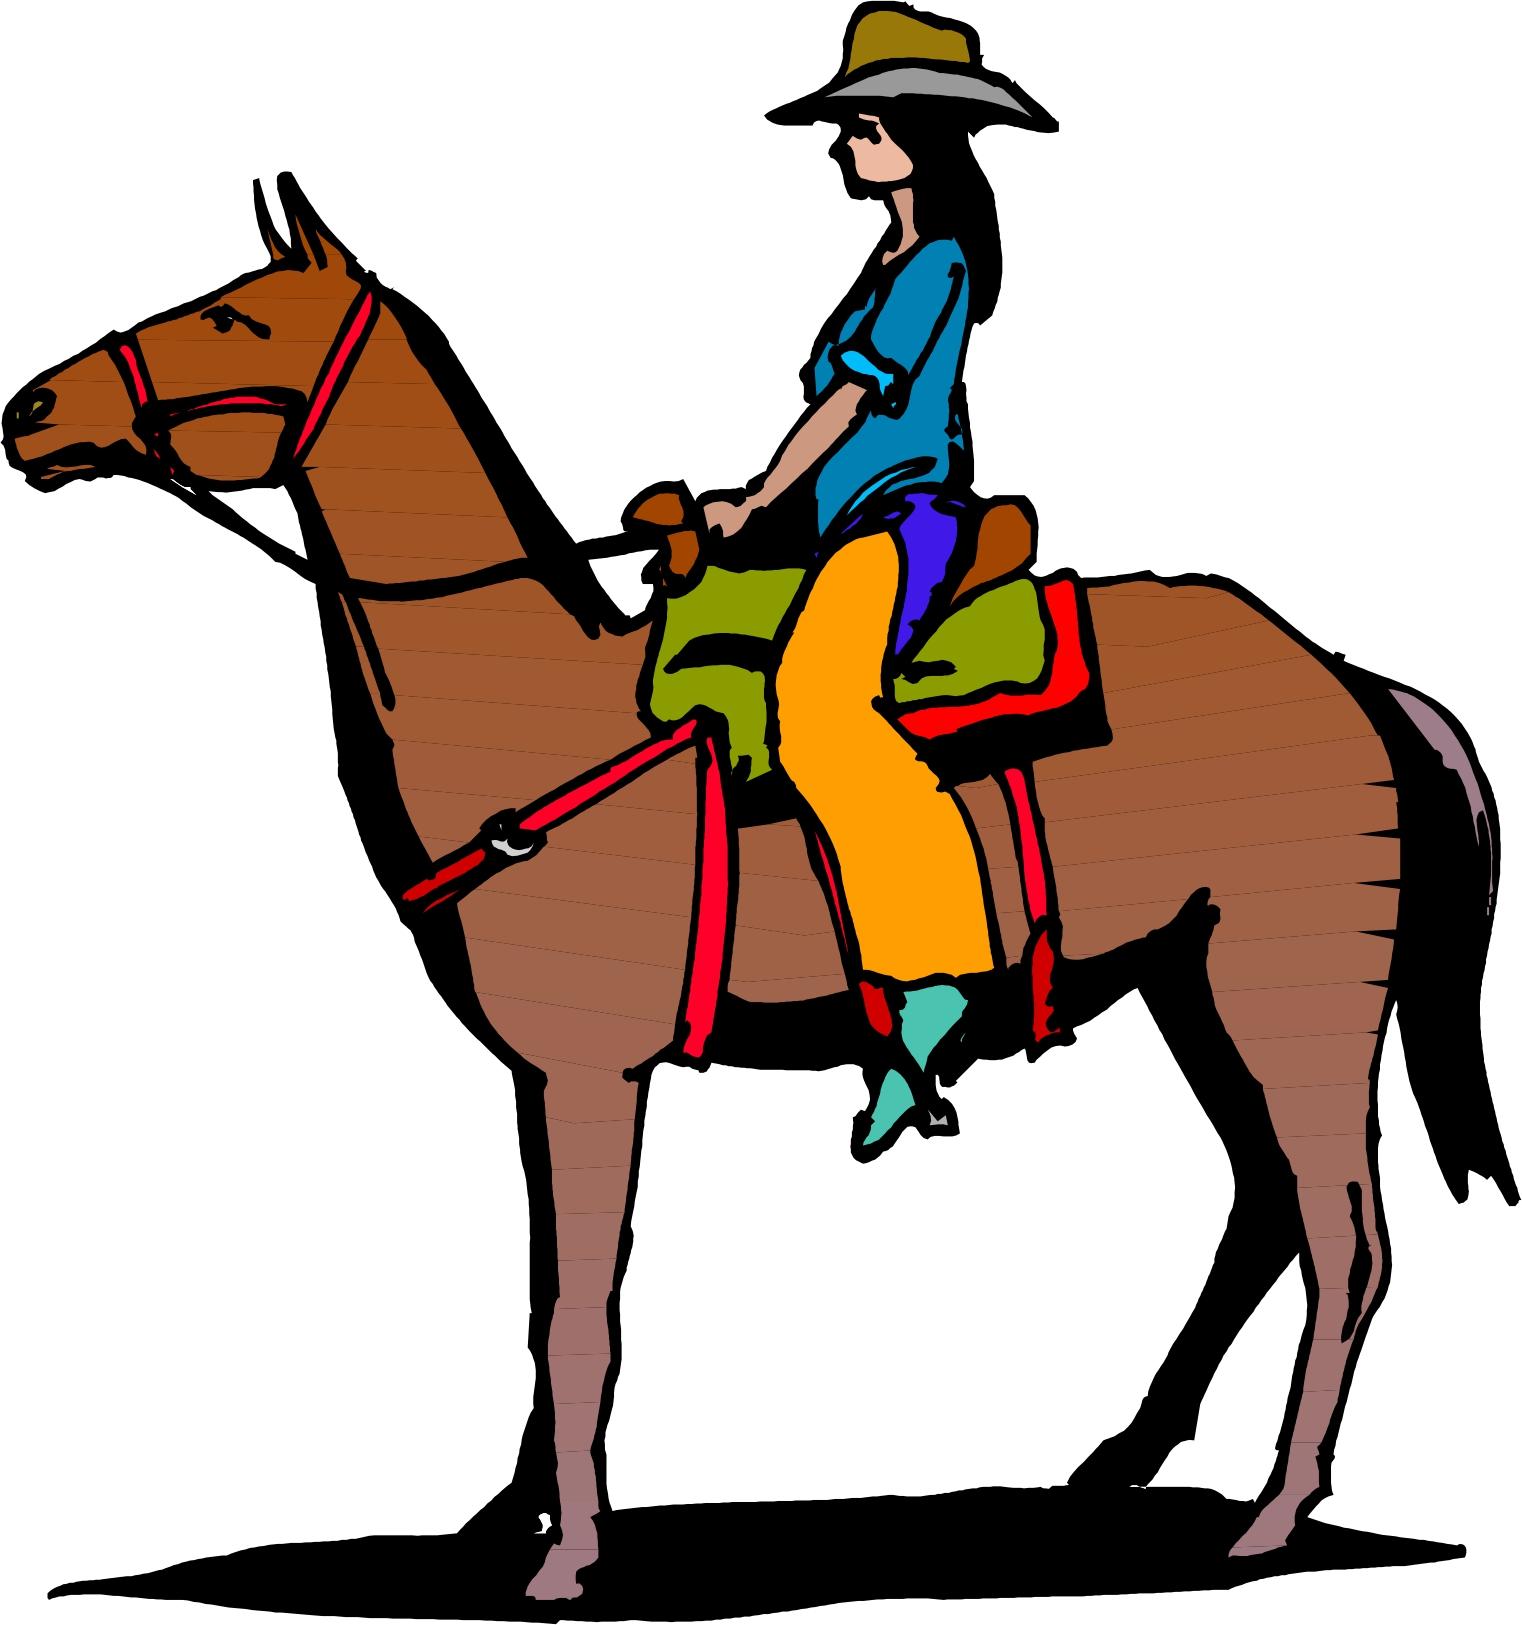 1522x1625 Horse Rider Clipart